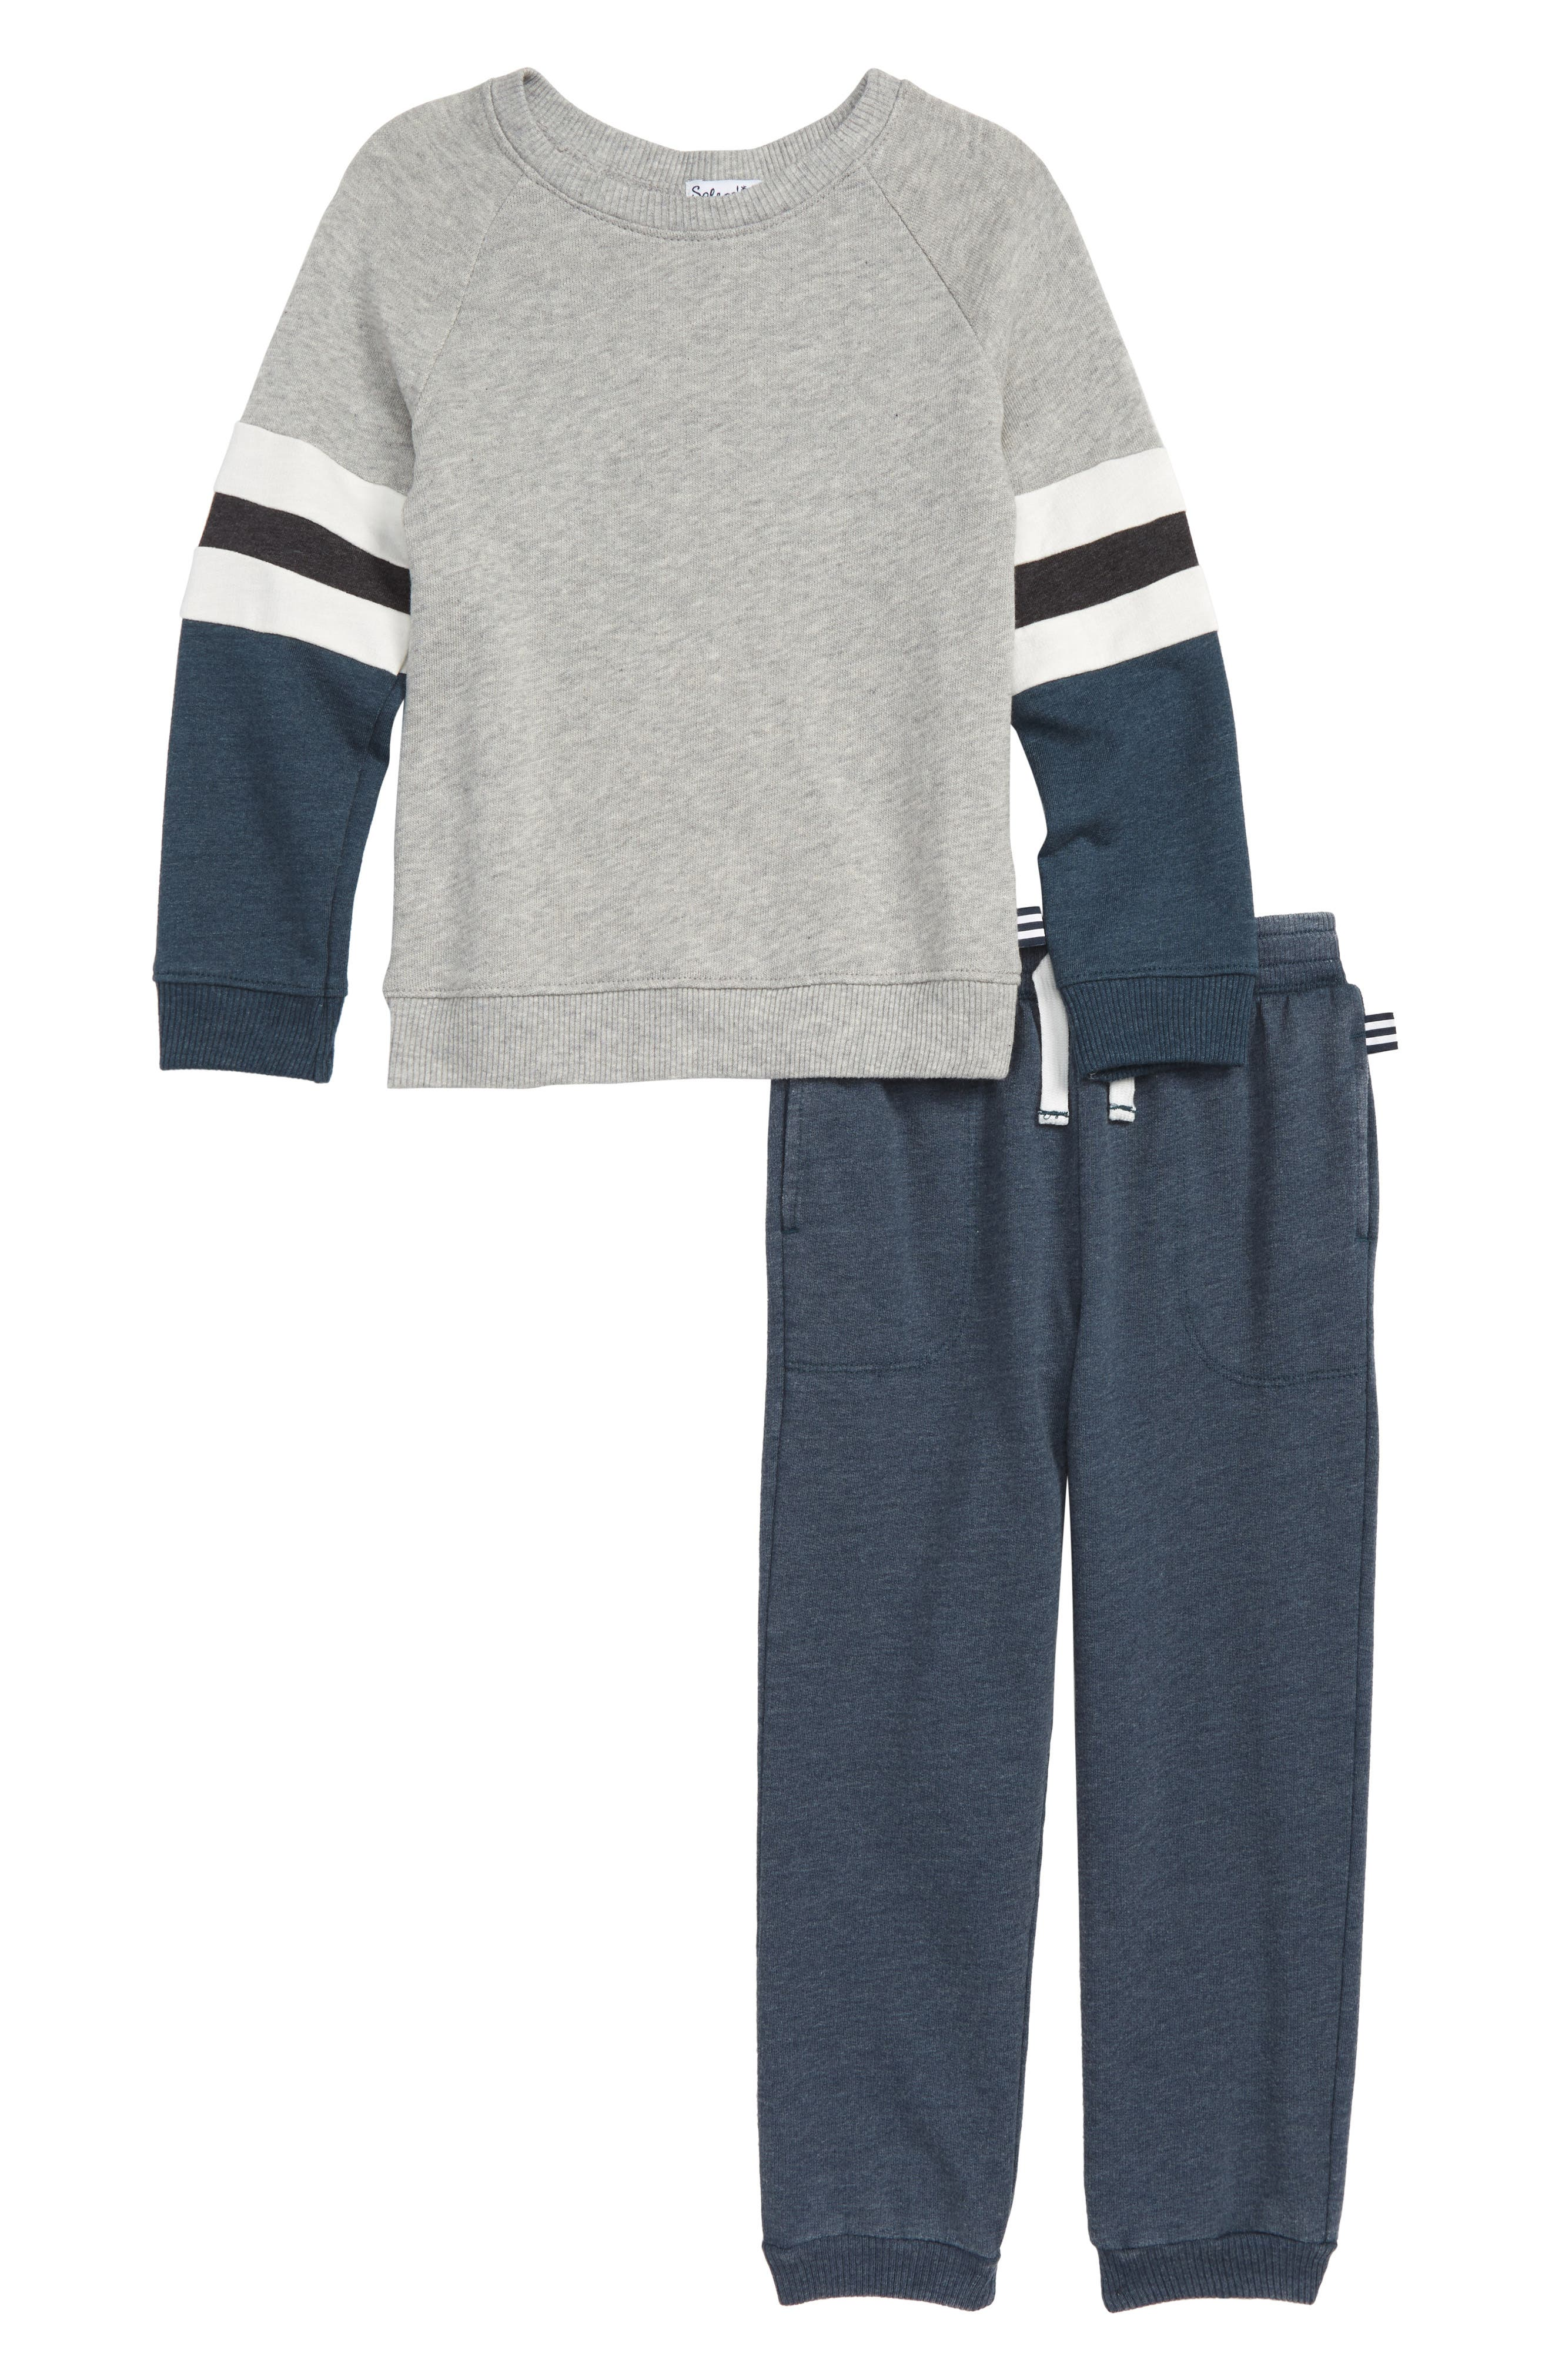 Toddler Boys Splendid Sweatshirt  Sweatpants Set